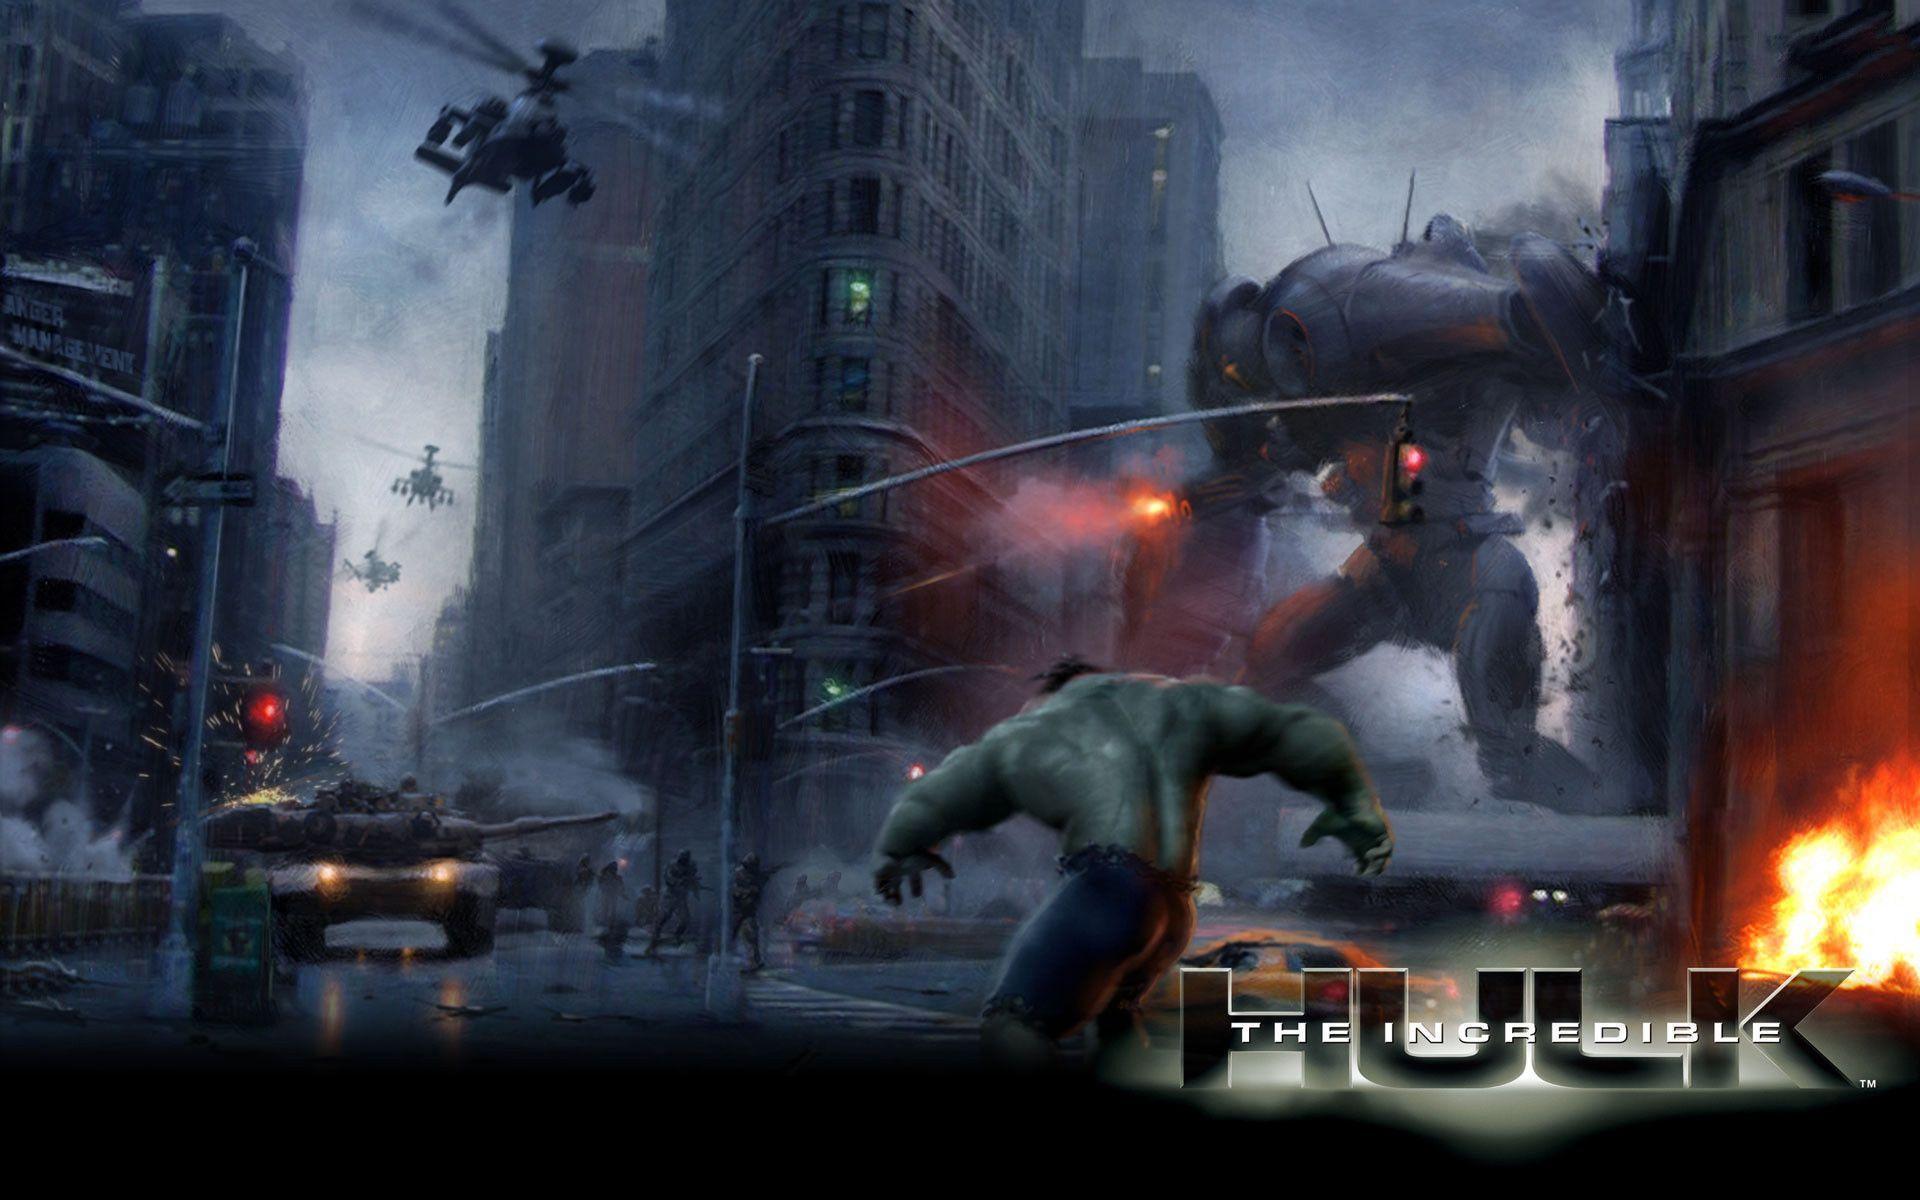 Pin Hulk Wallpapers Top My 2 on Pinterest